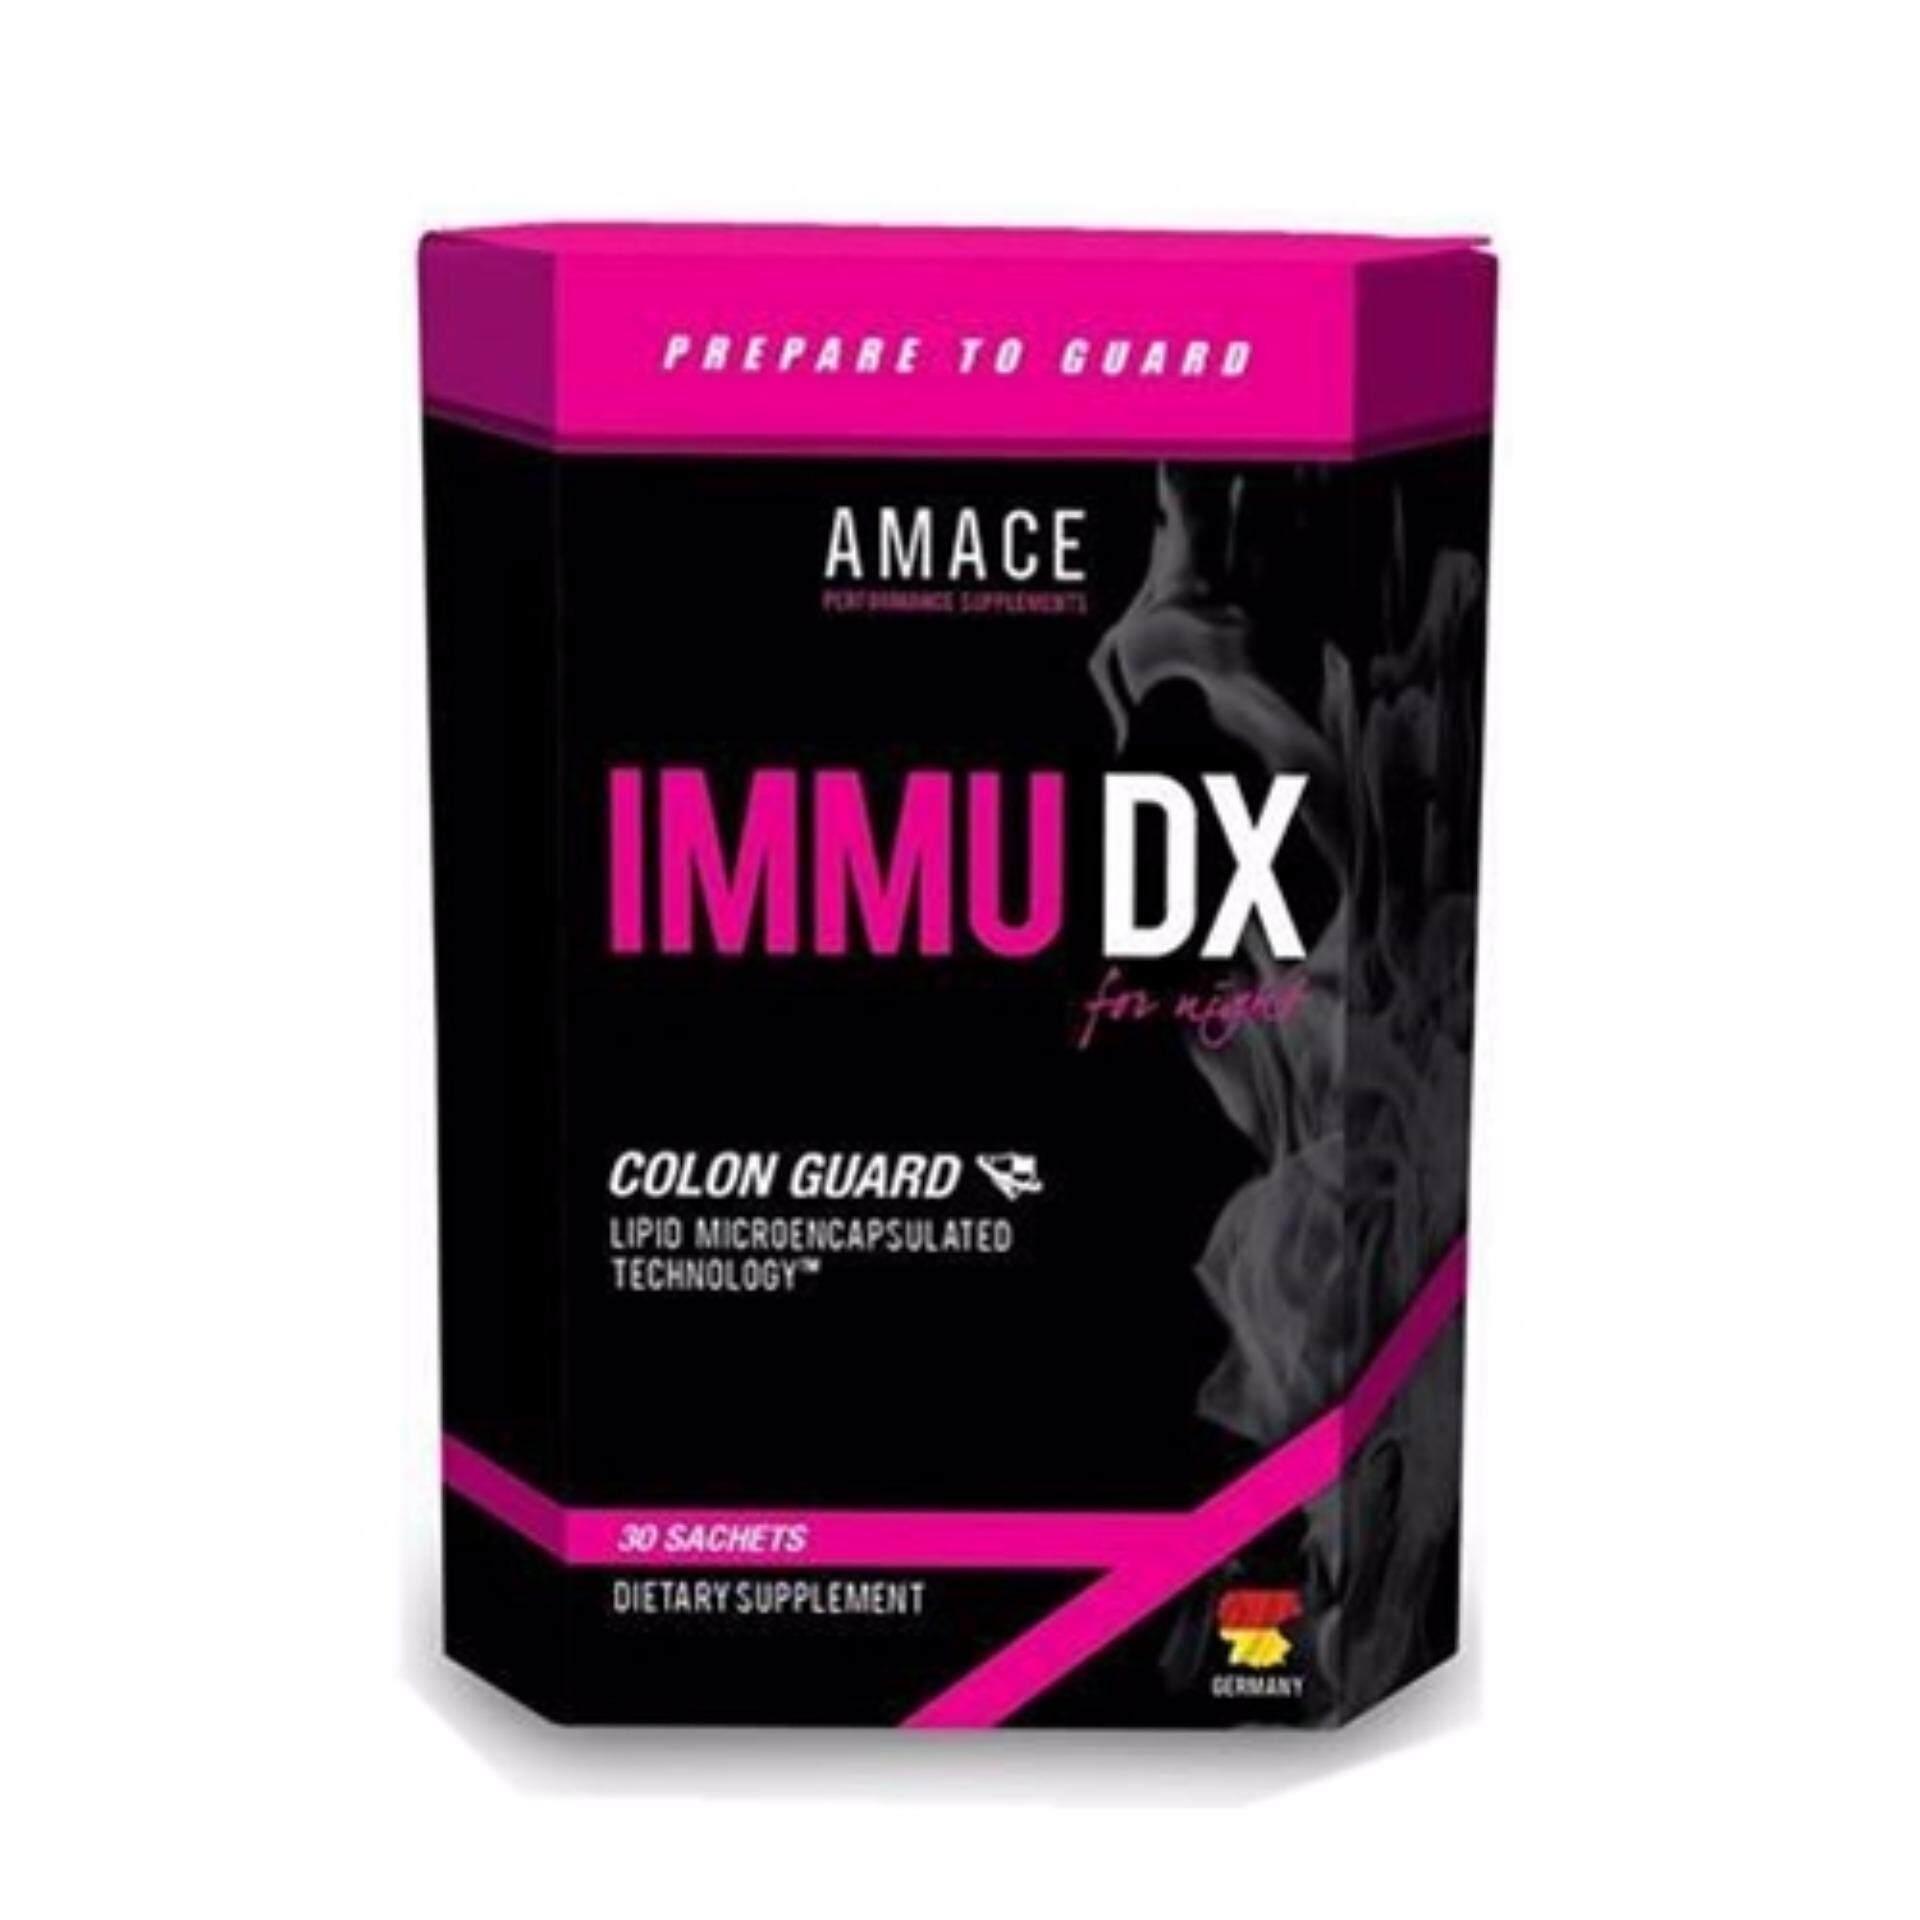 【AMACE】IMMU DX Colon Guard Detox Drink (1 box)